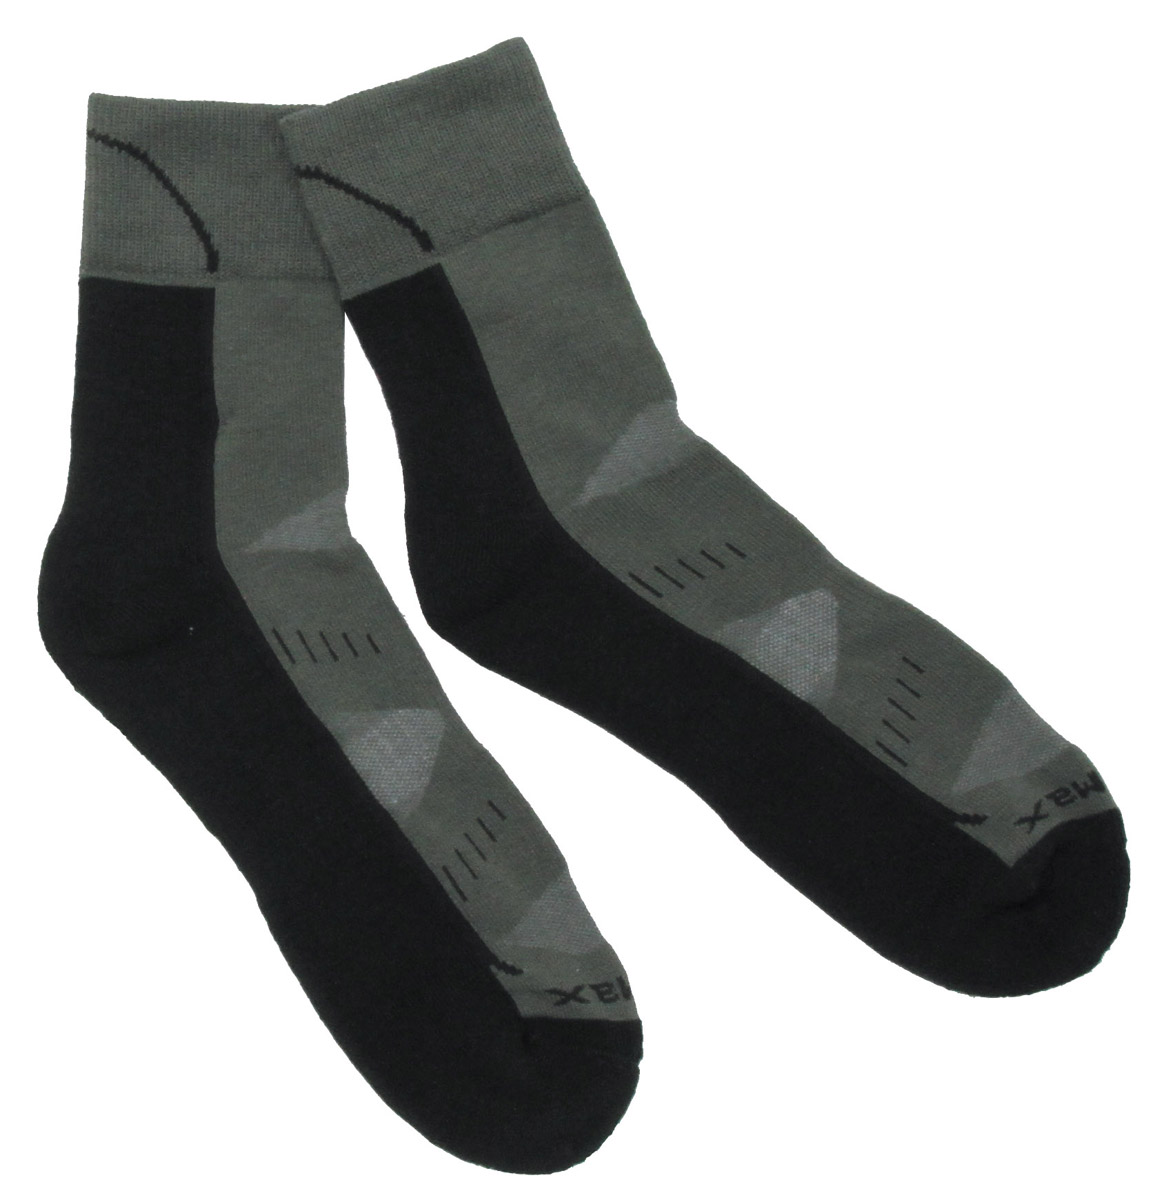 R Mischung  39-47 Trekking Socken Arber Freizeit Outdoor kurze Form COOLMAX